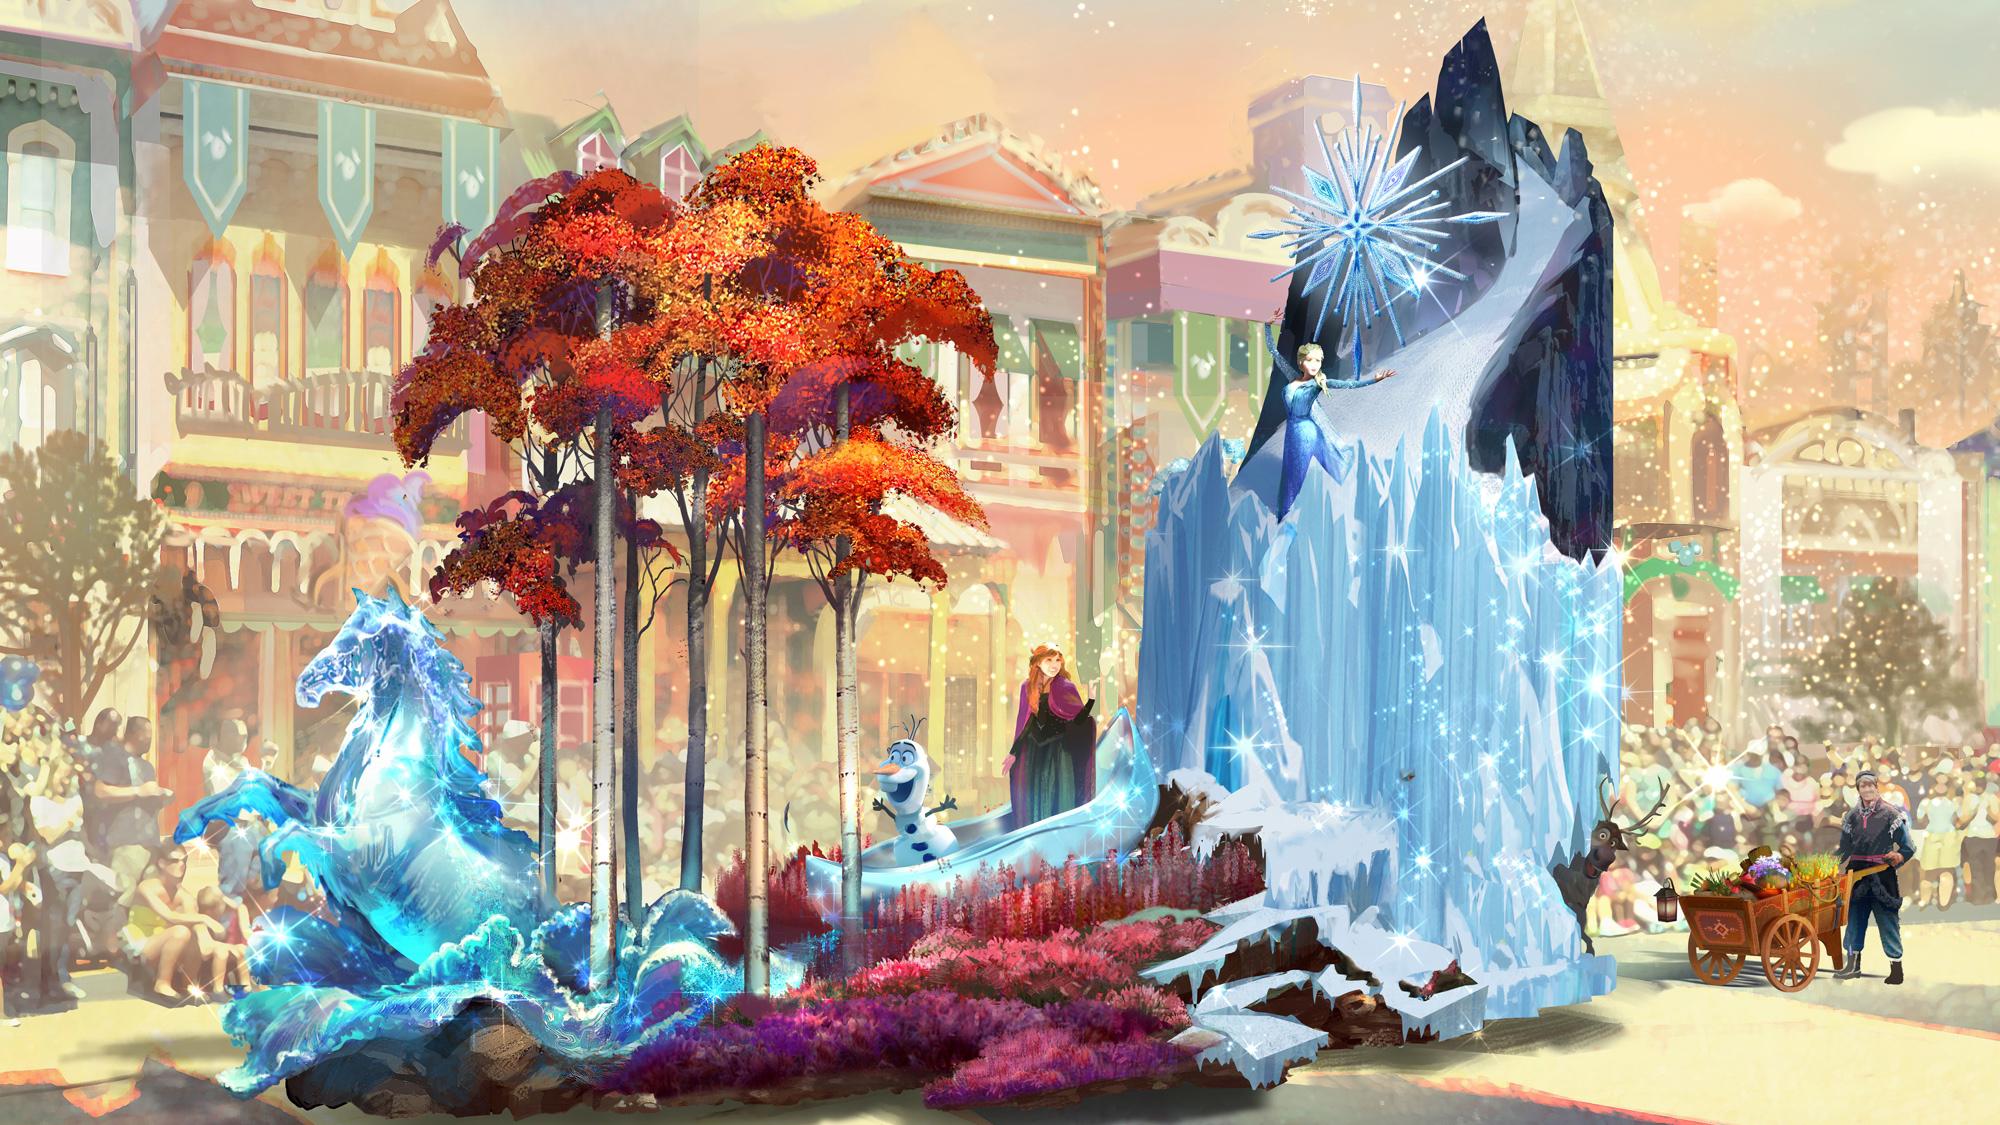 The new Magic Happens parade will debut at Disneyland Resort Feb. 28.